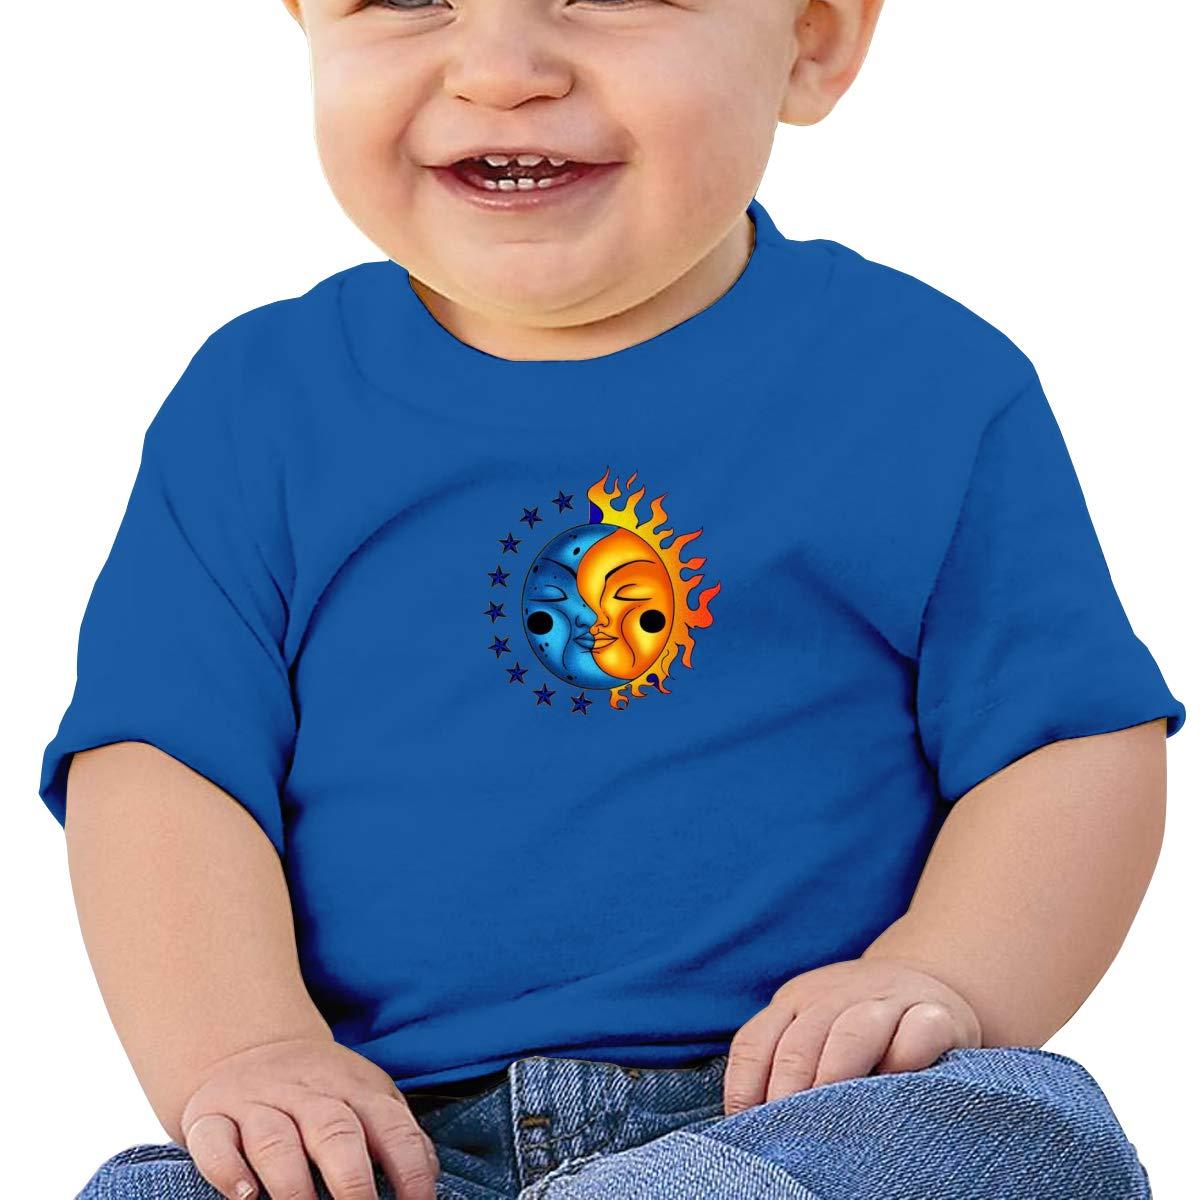 XHX403 Skull Punk Ride Skateboard Infant Kids T Shirt Cotton Tee Toddler Baby 6-18M